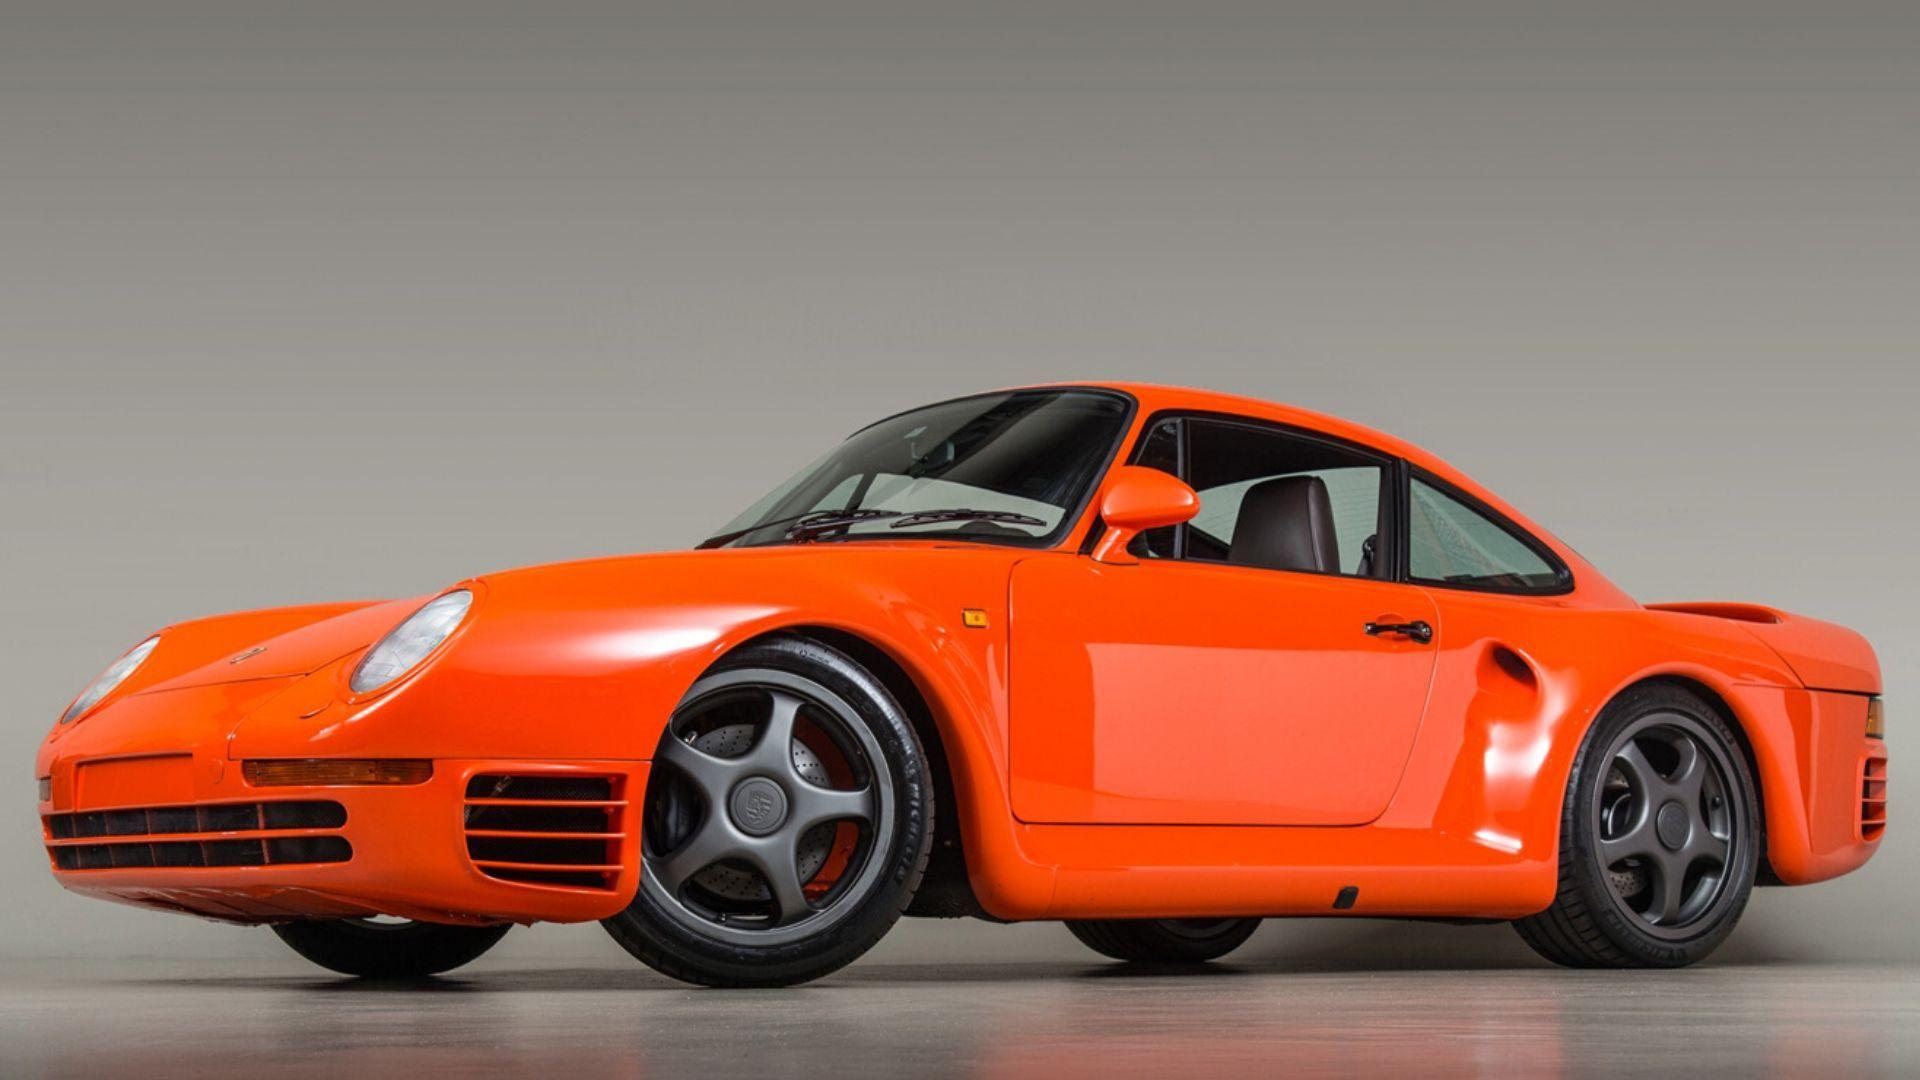 Canepa Created A Restomod Porsche 959